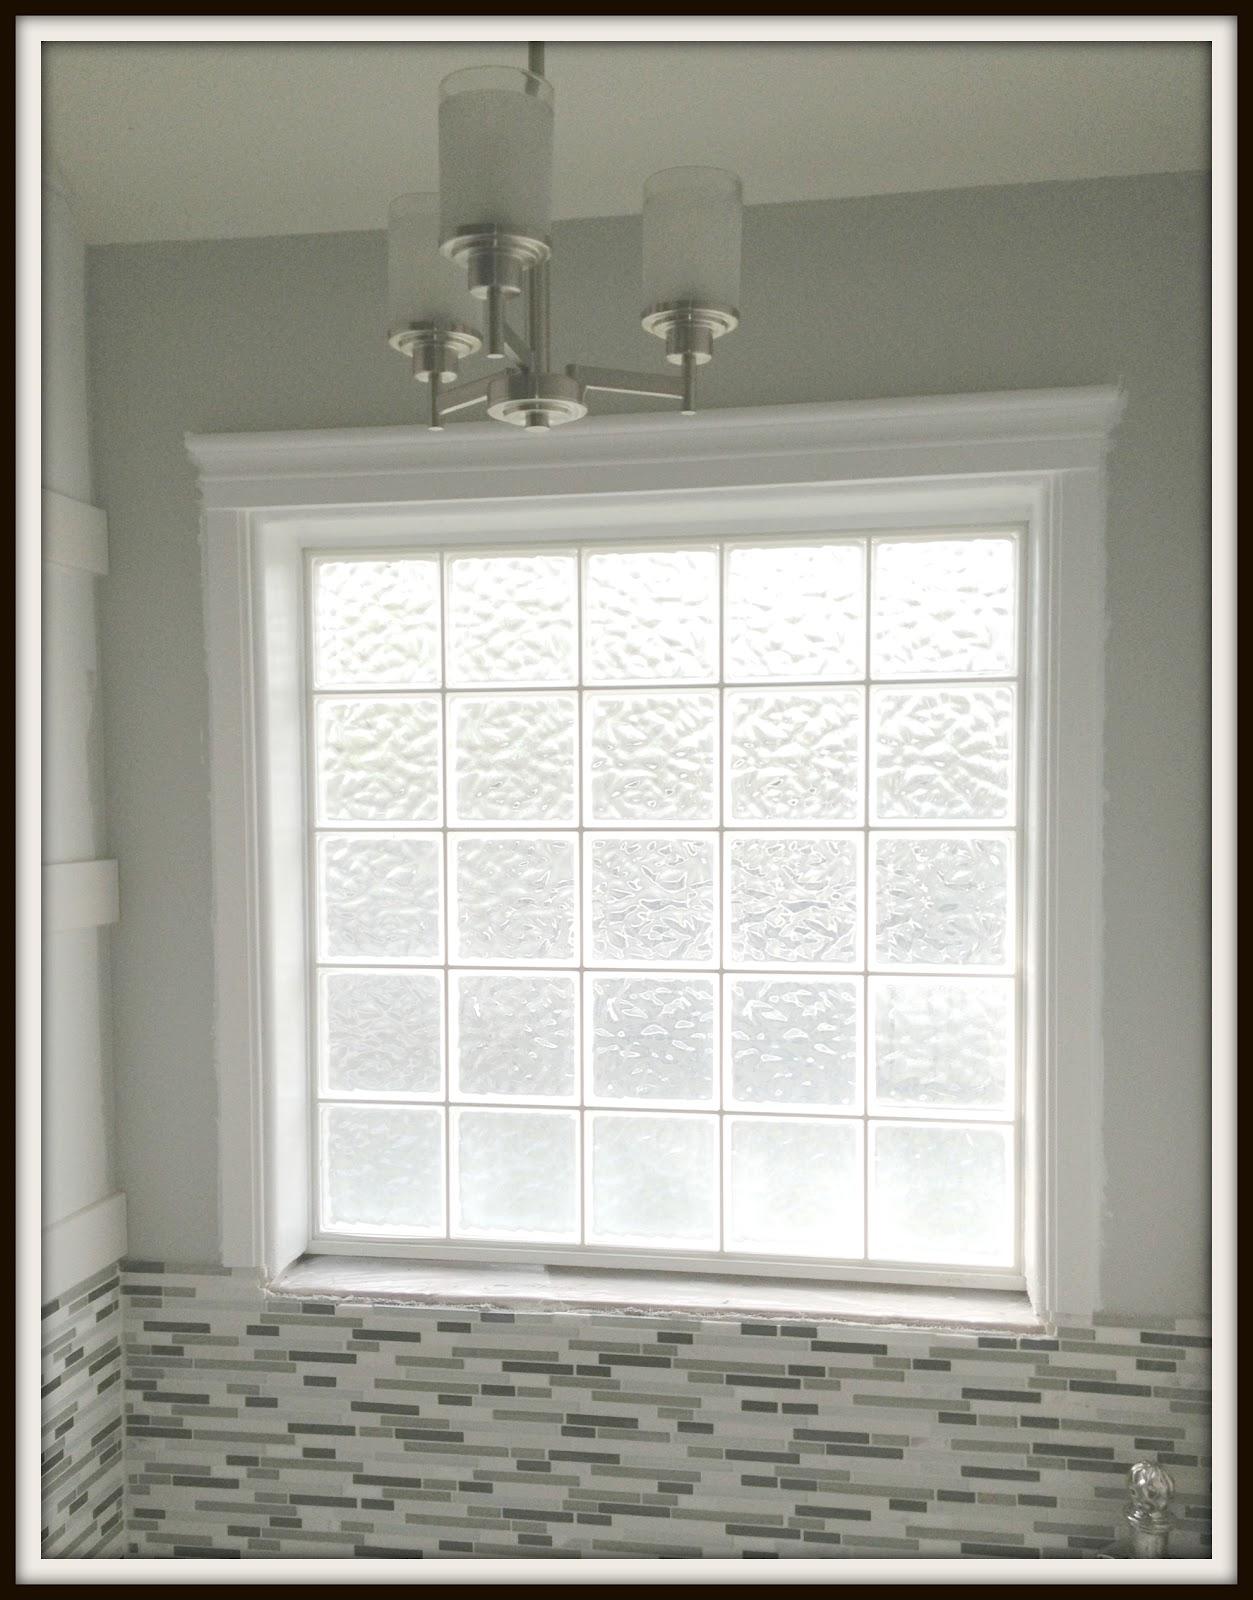 Bathroom Framed Wall Decor: Future House Design: Modern Glass Window Bathroom Design